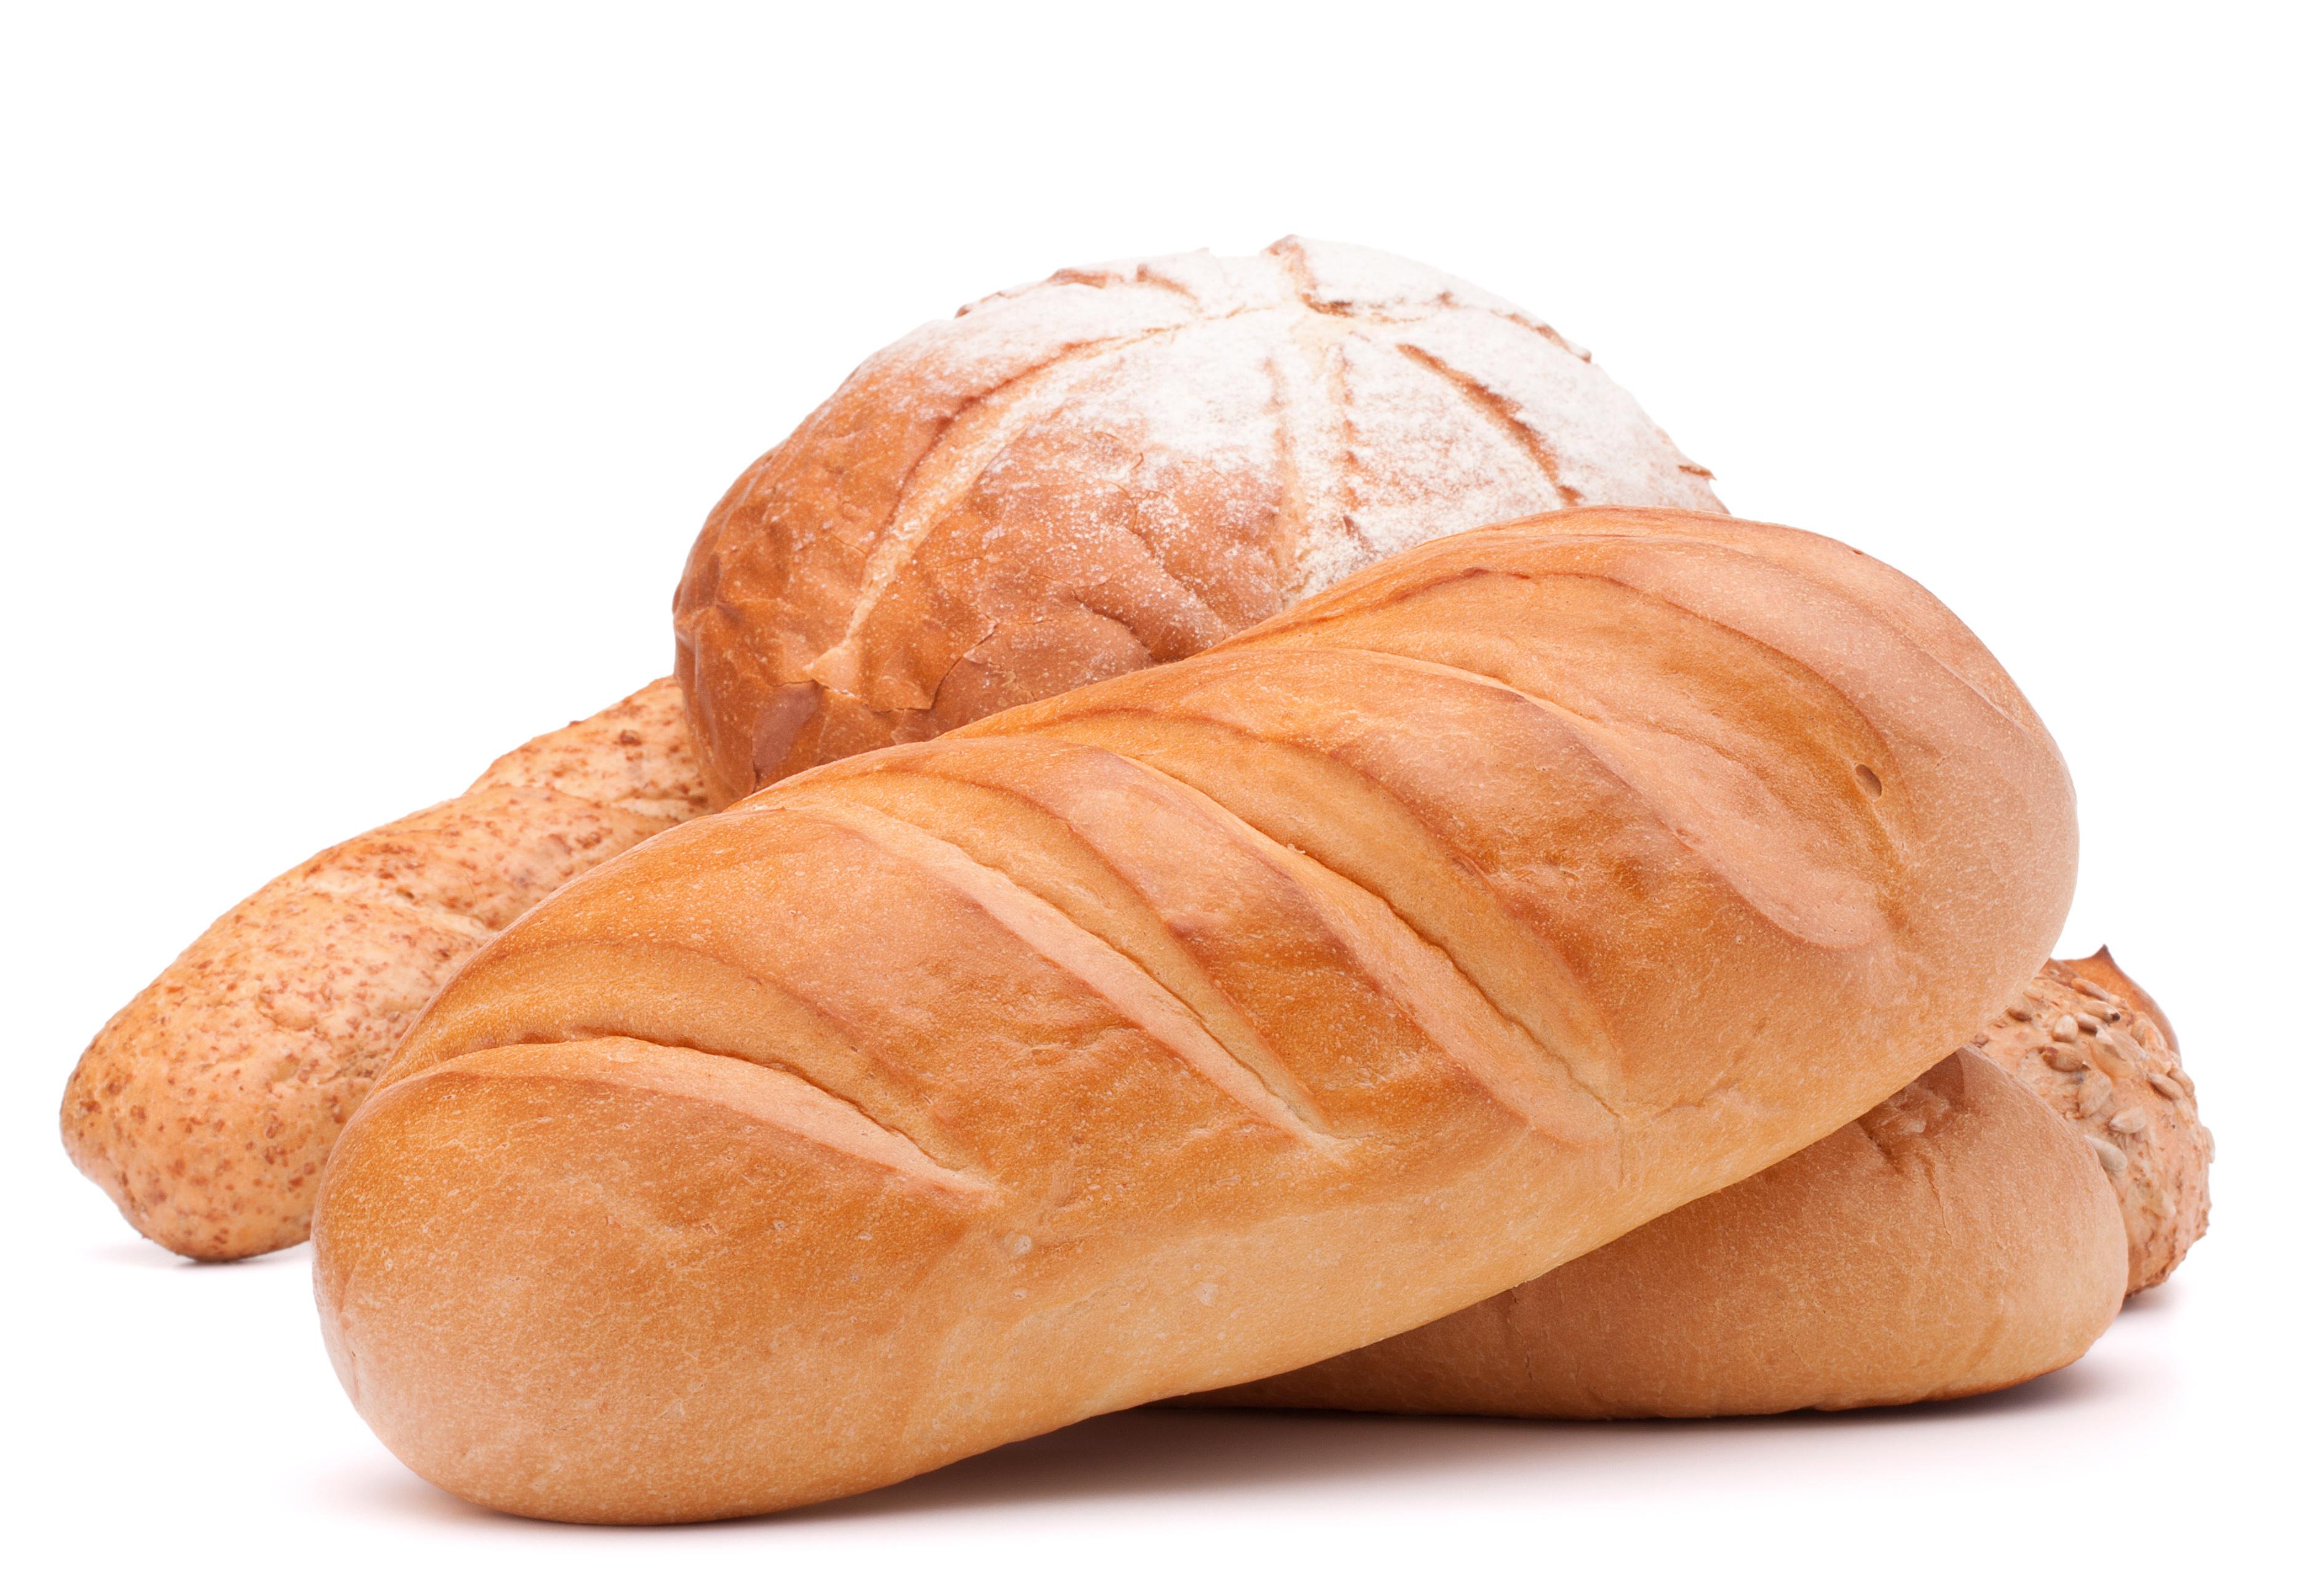 Zojirushi BB-PAC20 VS Zojirushi BB-CEC20: Bread Maker Comparison ...